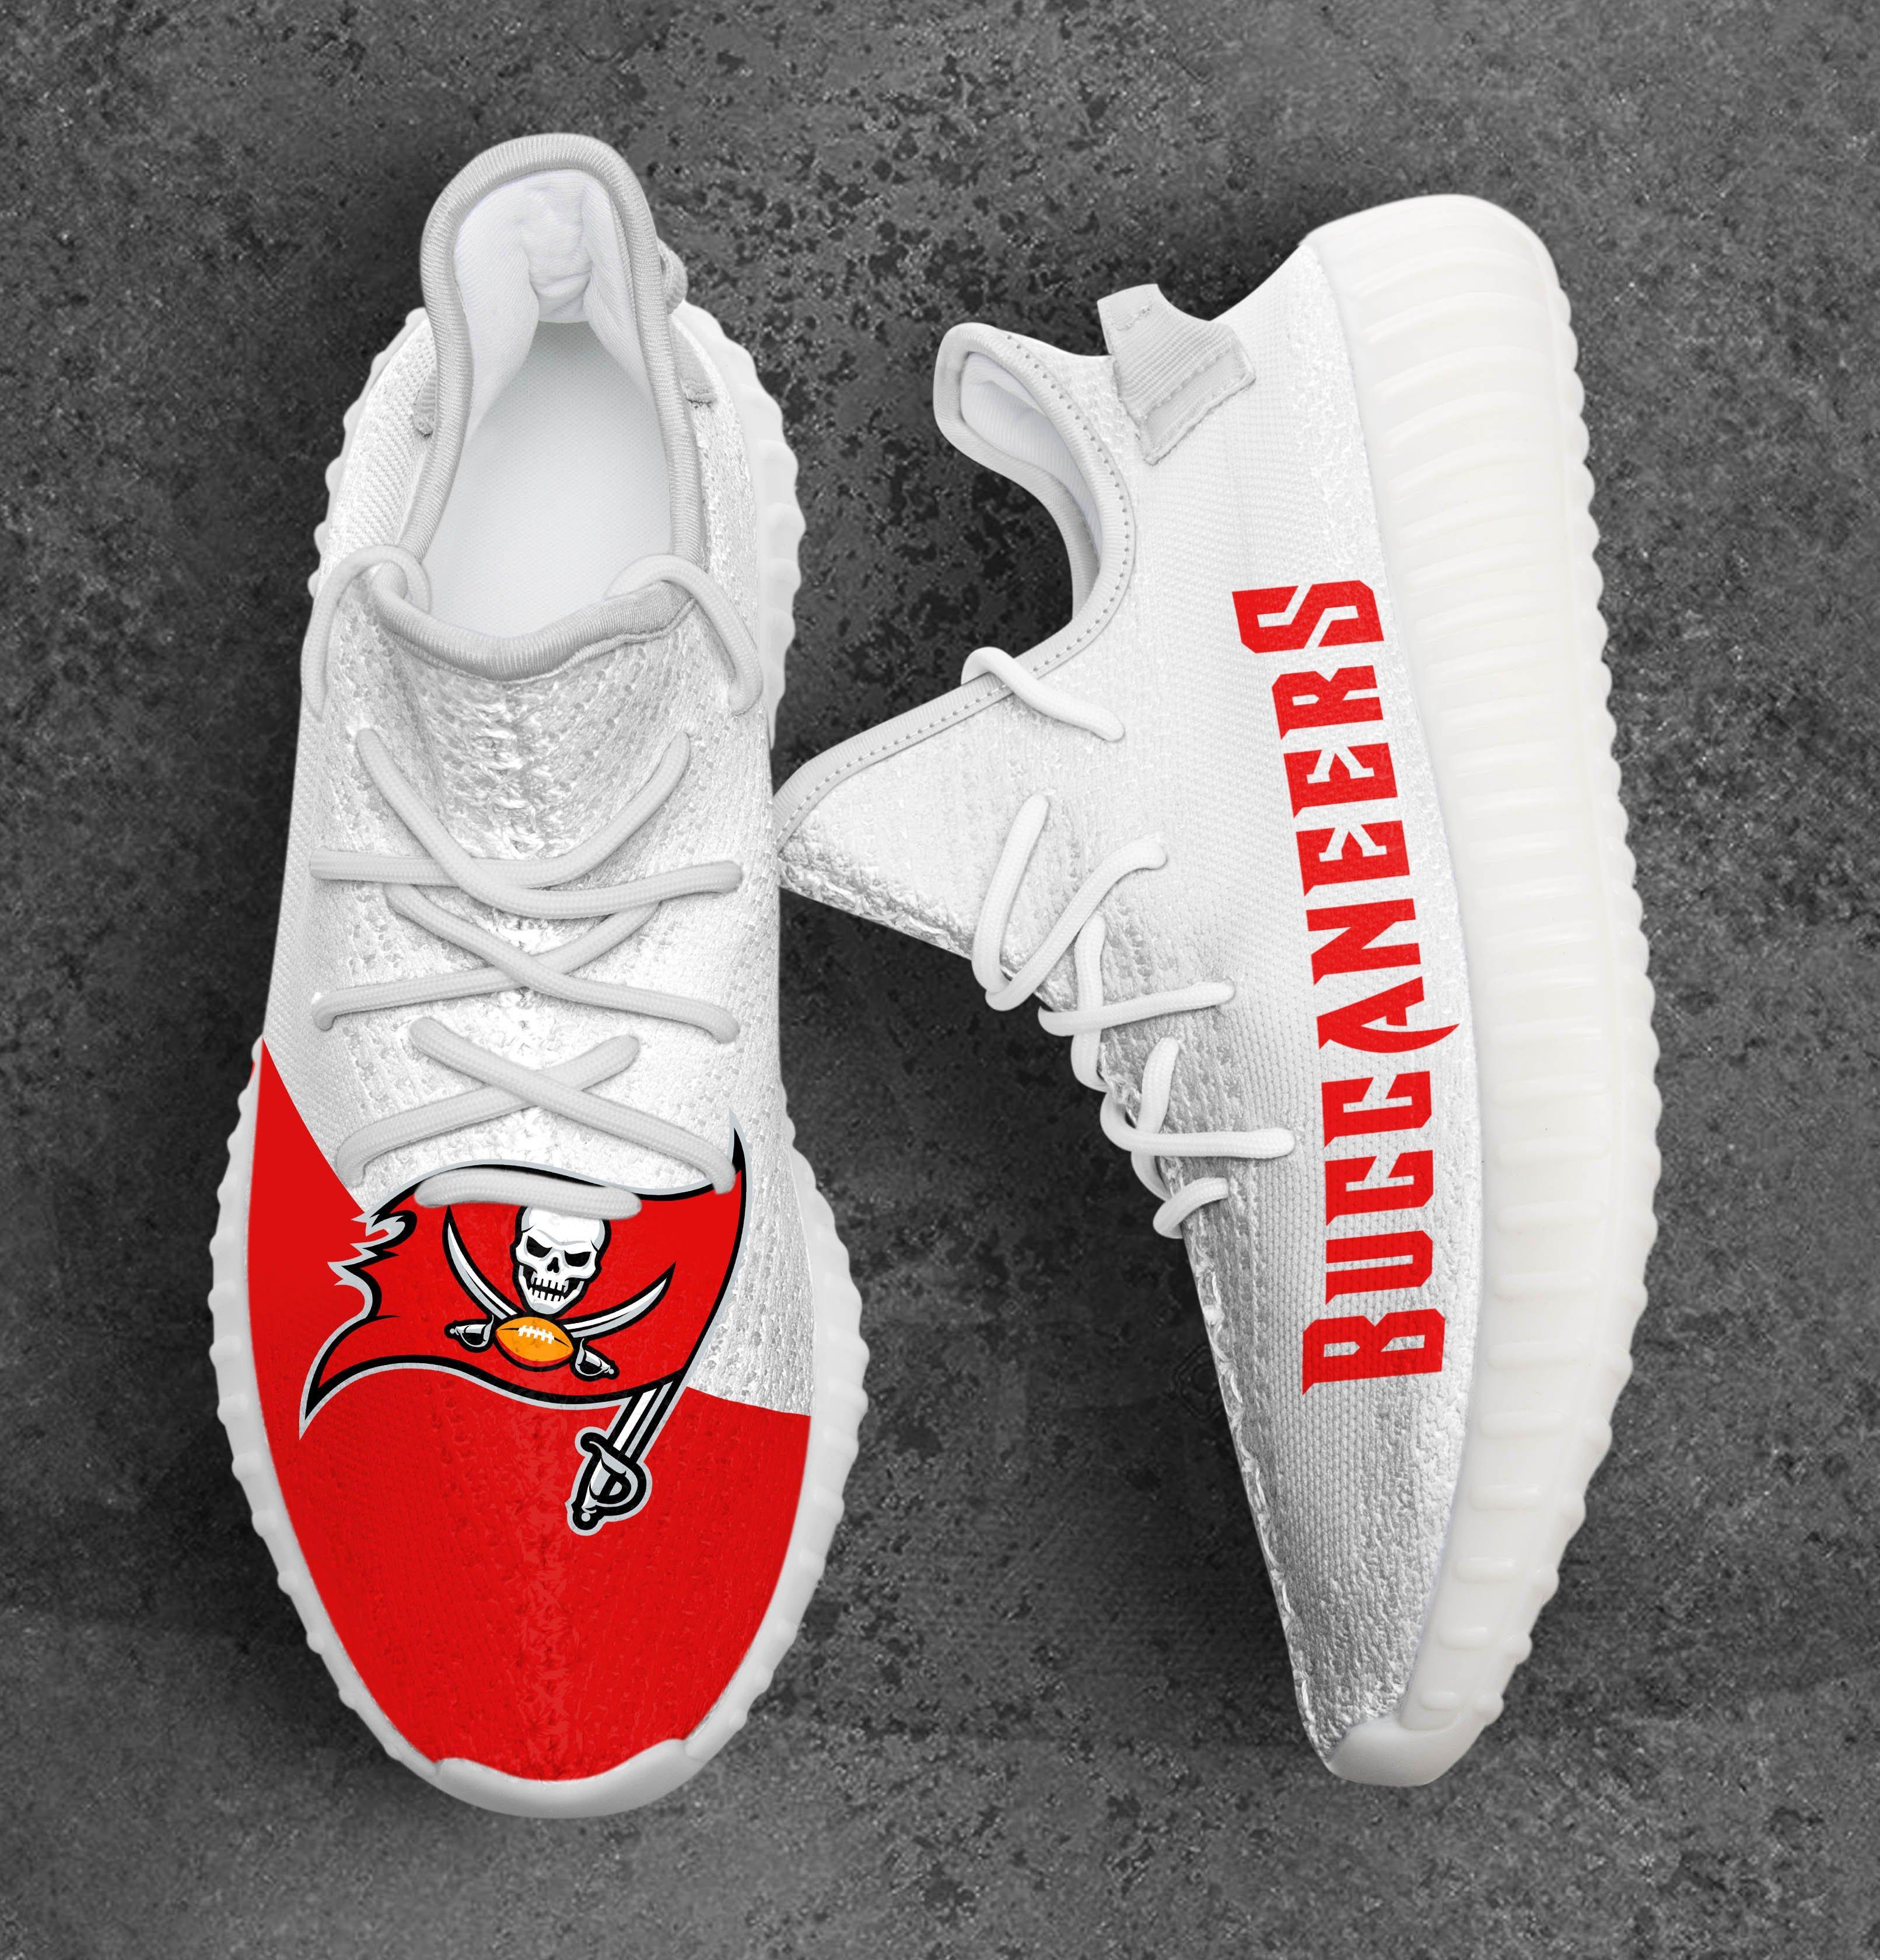 Tampa Bay Buccaneers NFL Sport Teams Adidas Yeezy Boost 350 V2 Top Branding Trends